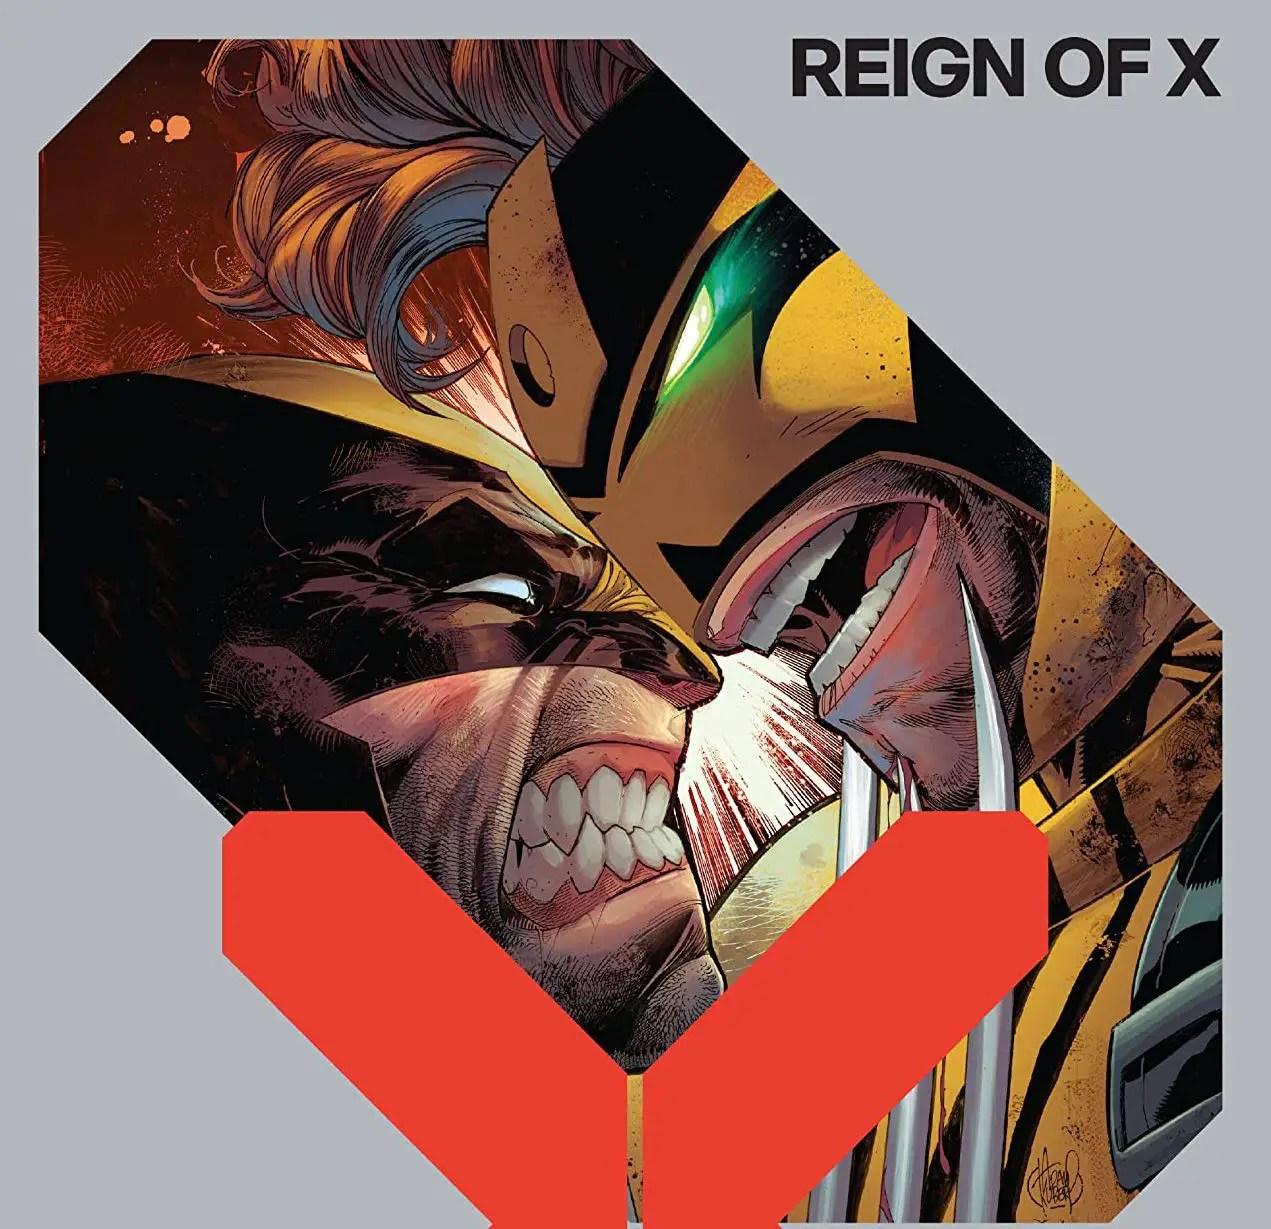 Reign of X Vol. 3